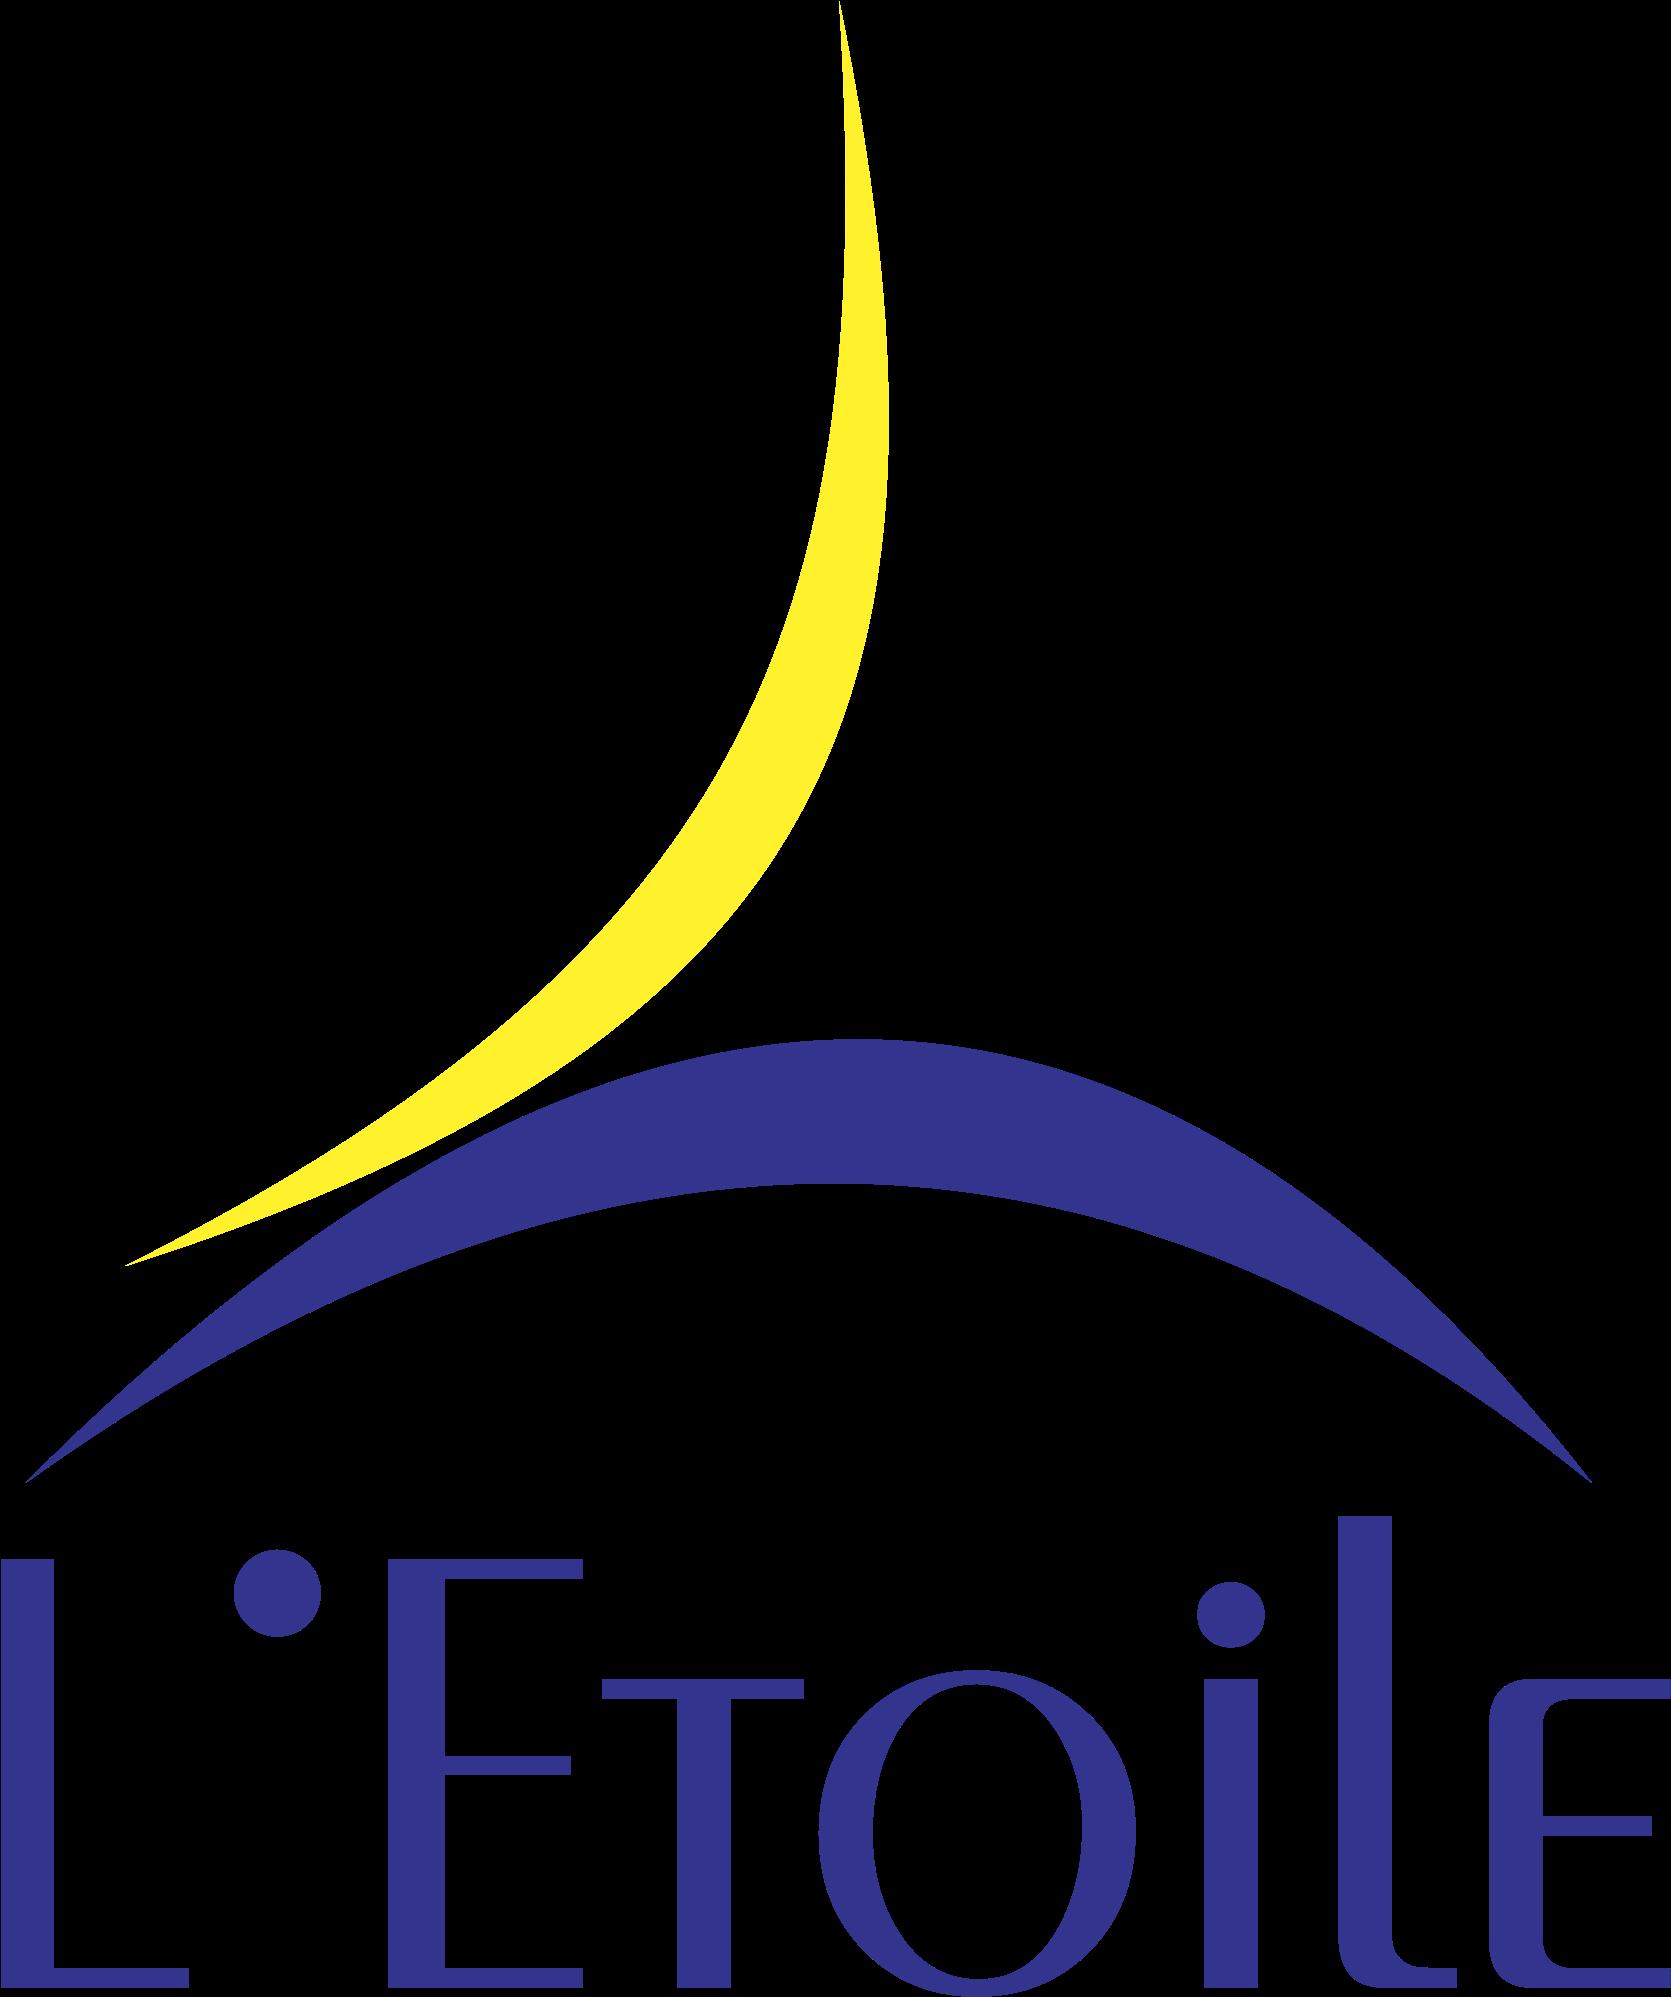 L Etoile Logo Png Transparent L Etoile Russia Clipart Full Size Clipart 4920967 Pinclipart